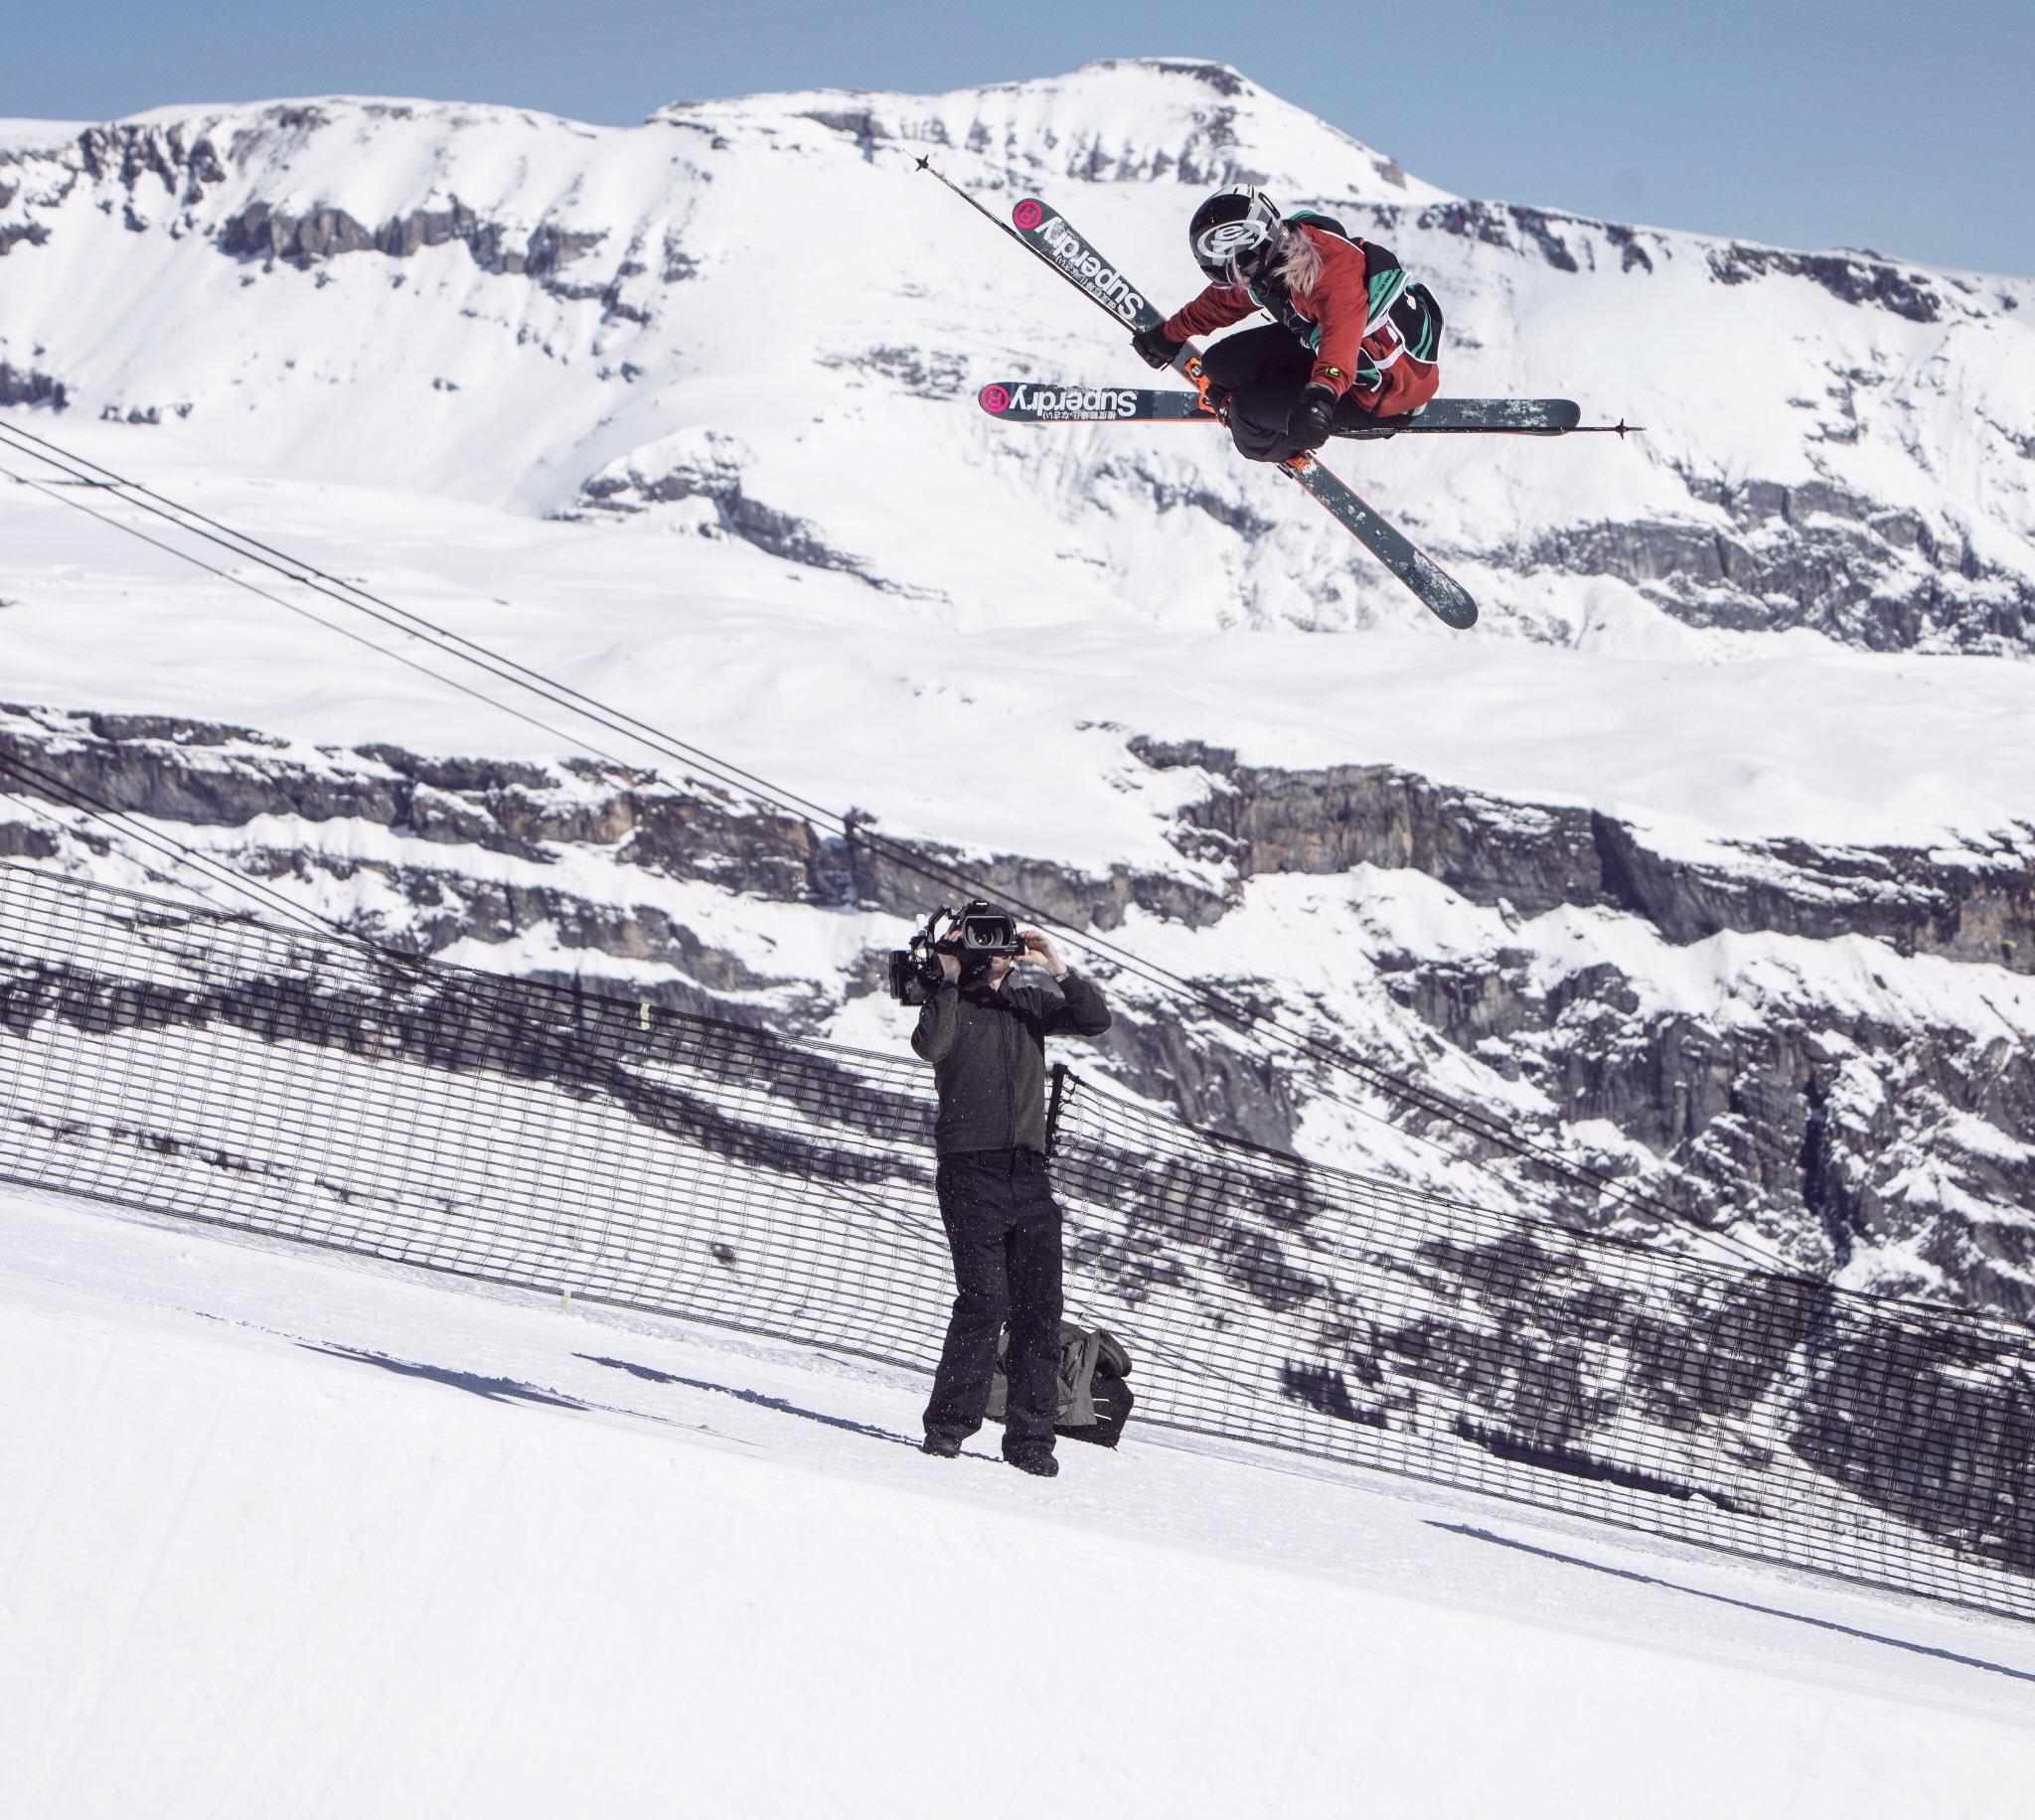 Skier Gb In Freestyle Halfpipe Team Cheshire Lessons Rowan qOCxSavwn